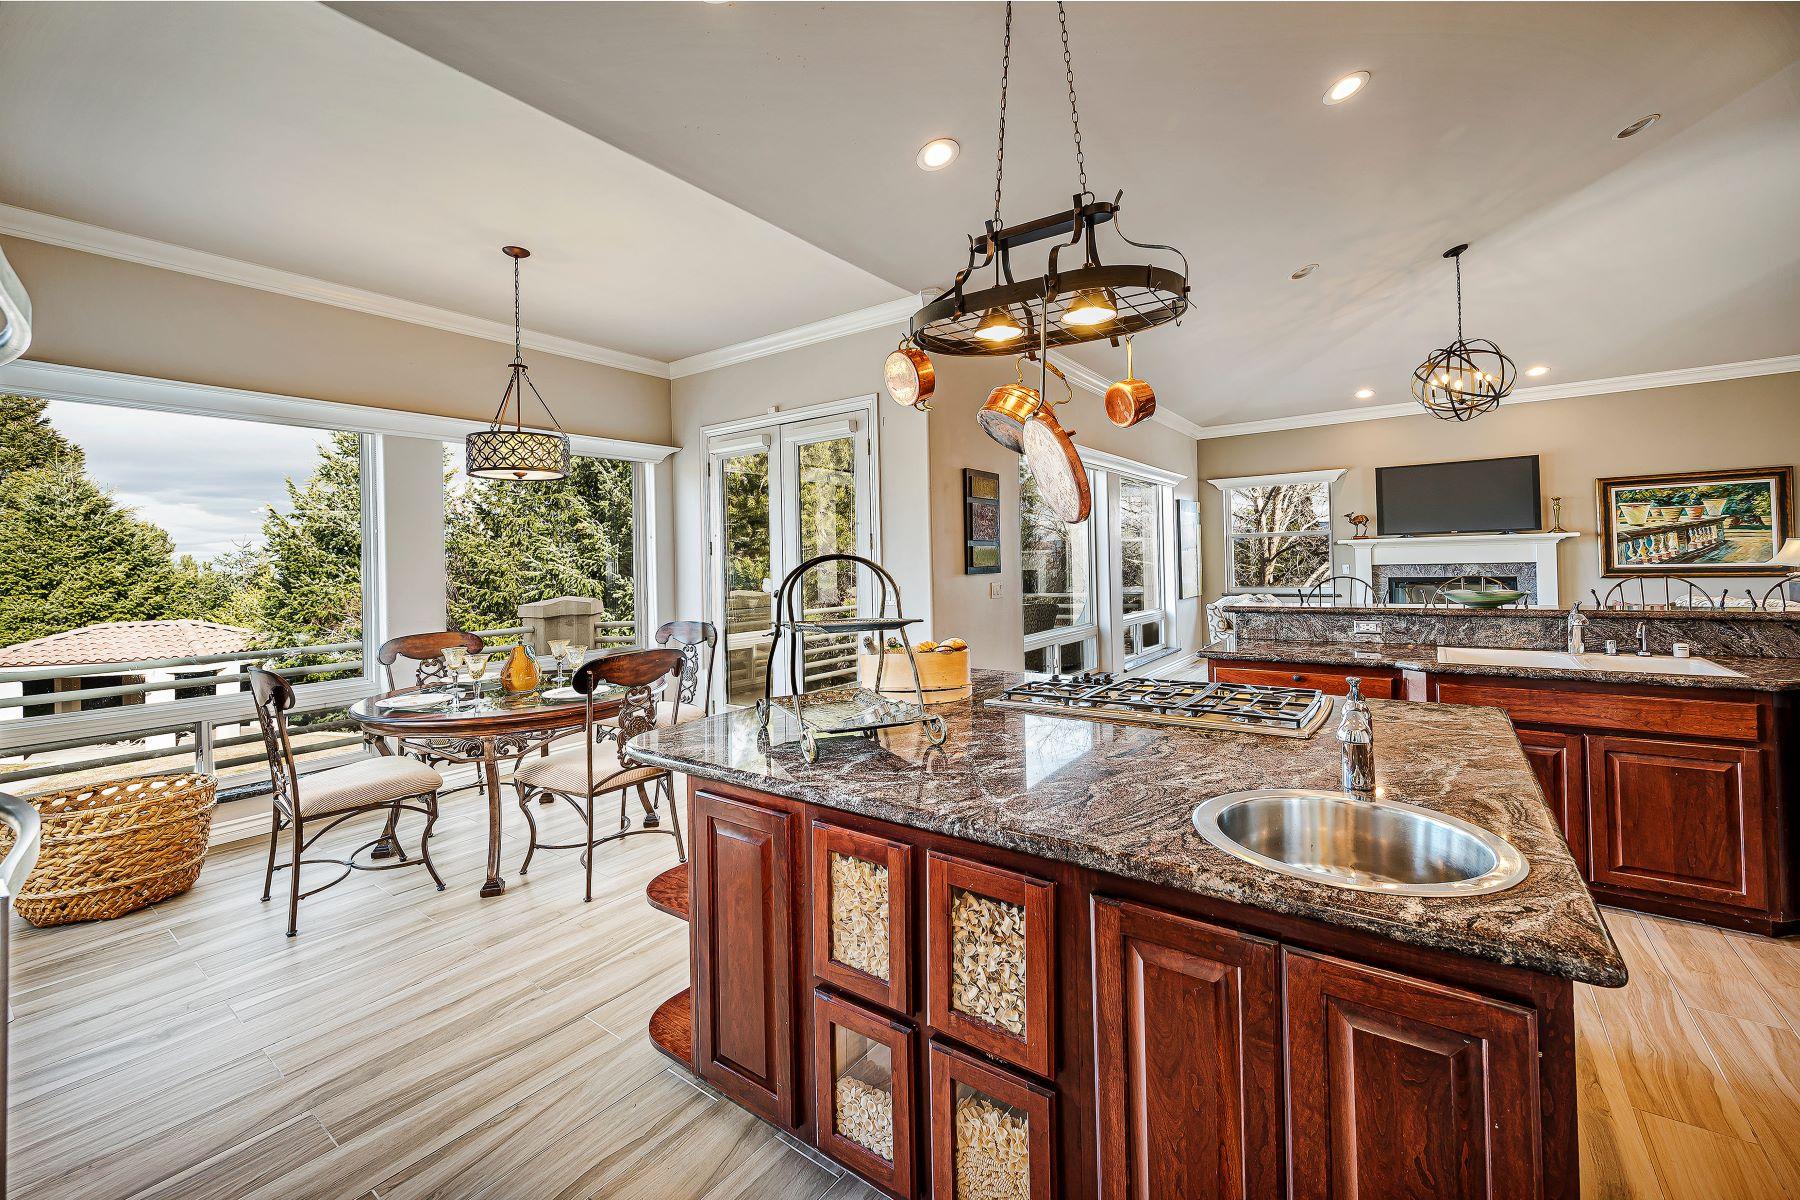 Additional photo for property listing at 1585 Star Way, Reno, NV 89511 1585 Star Way 里诺, 内华达州 89511 美国